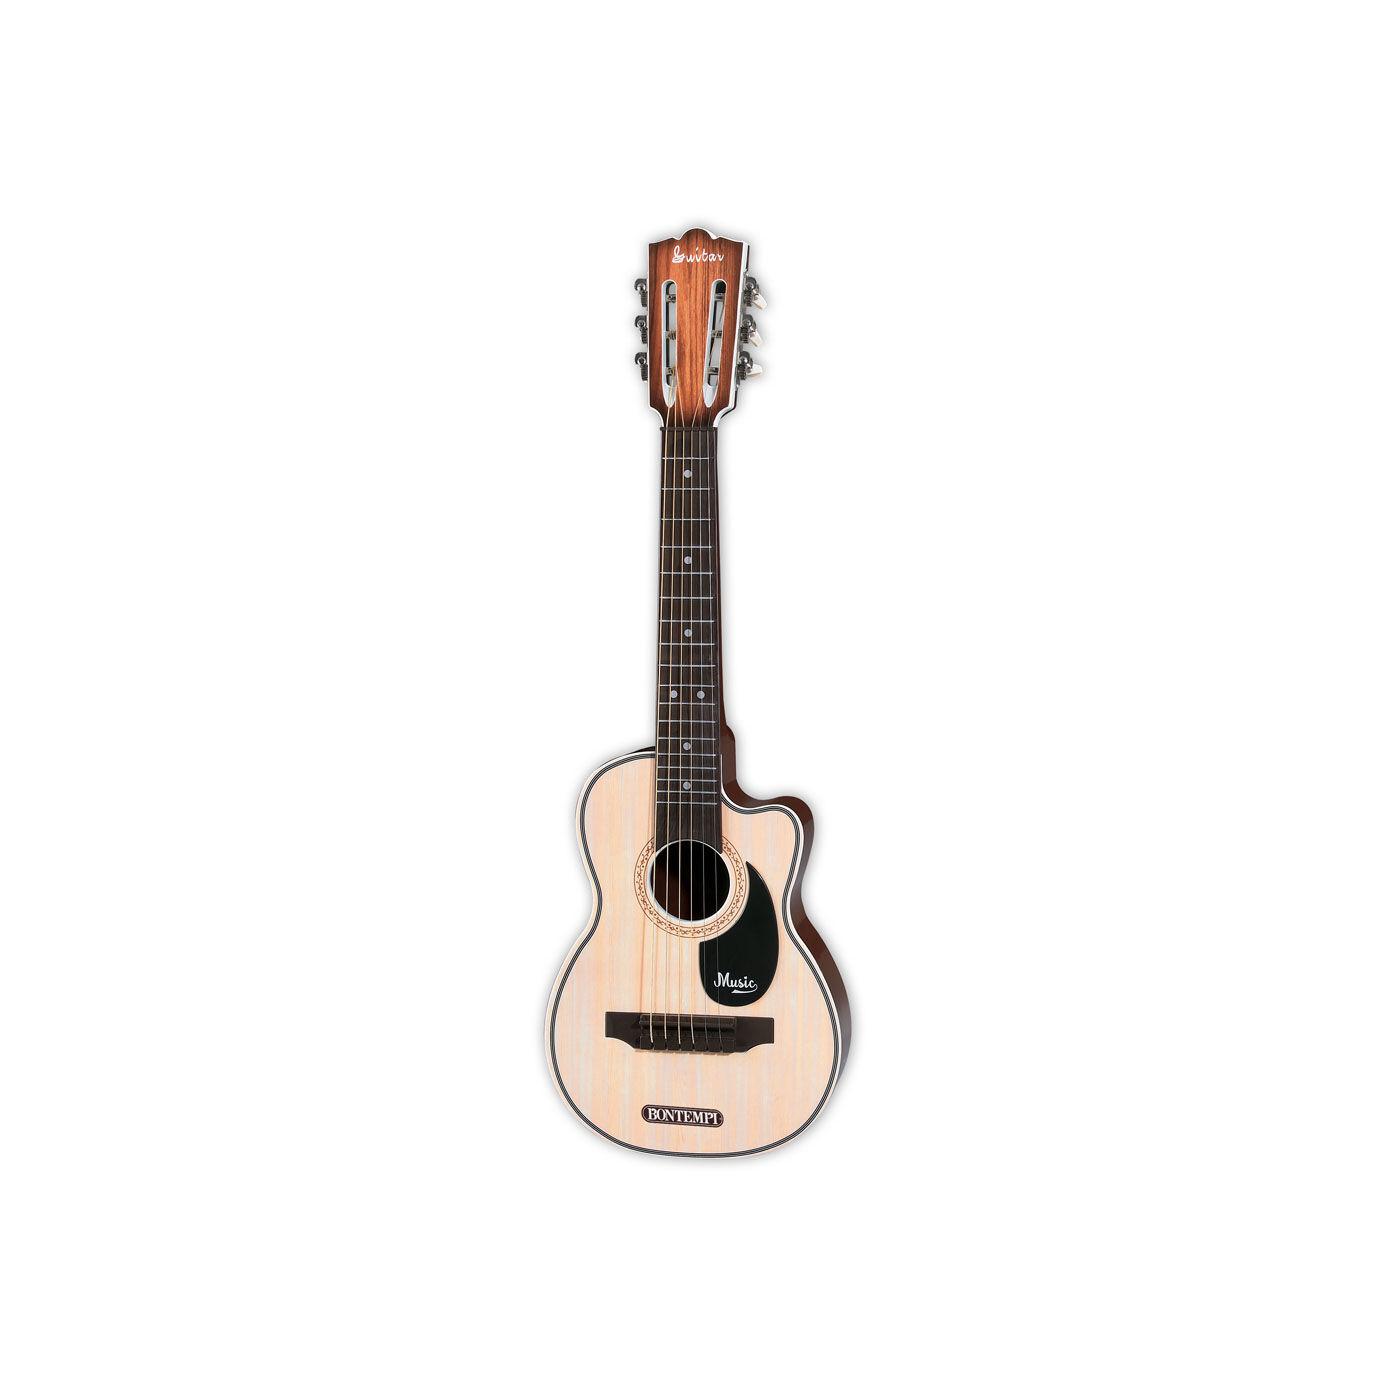 Bontempi Folk gitár